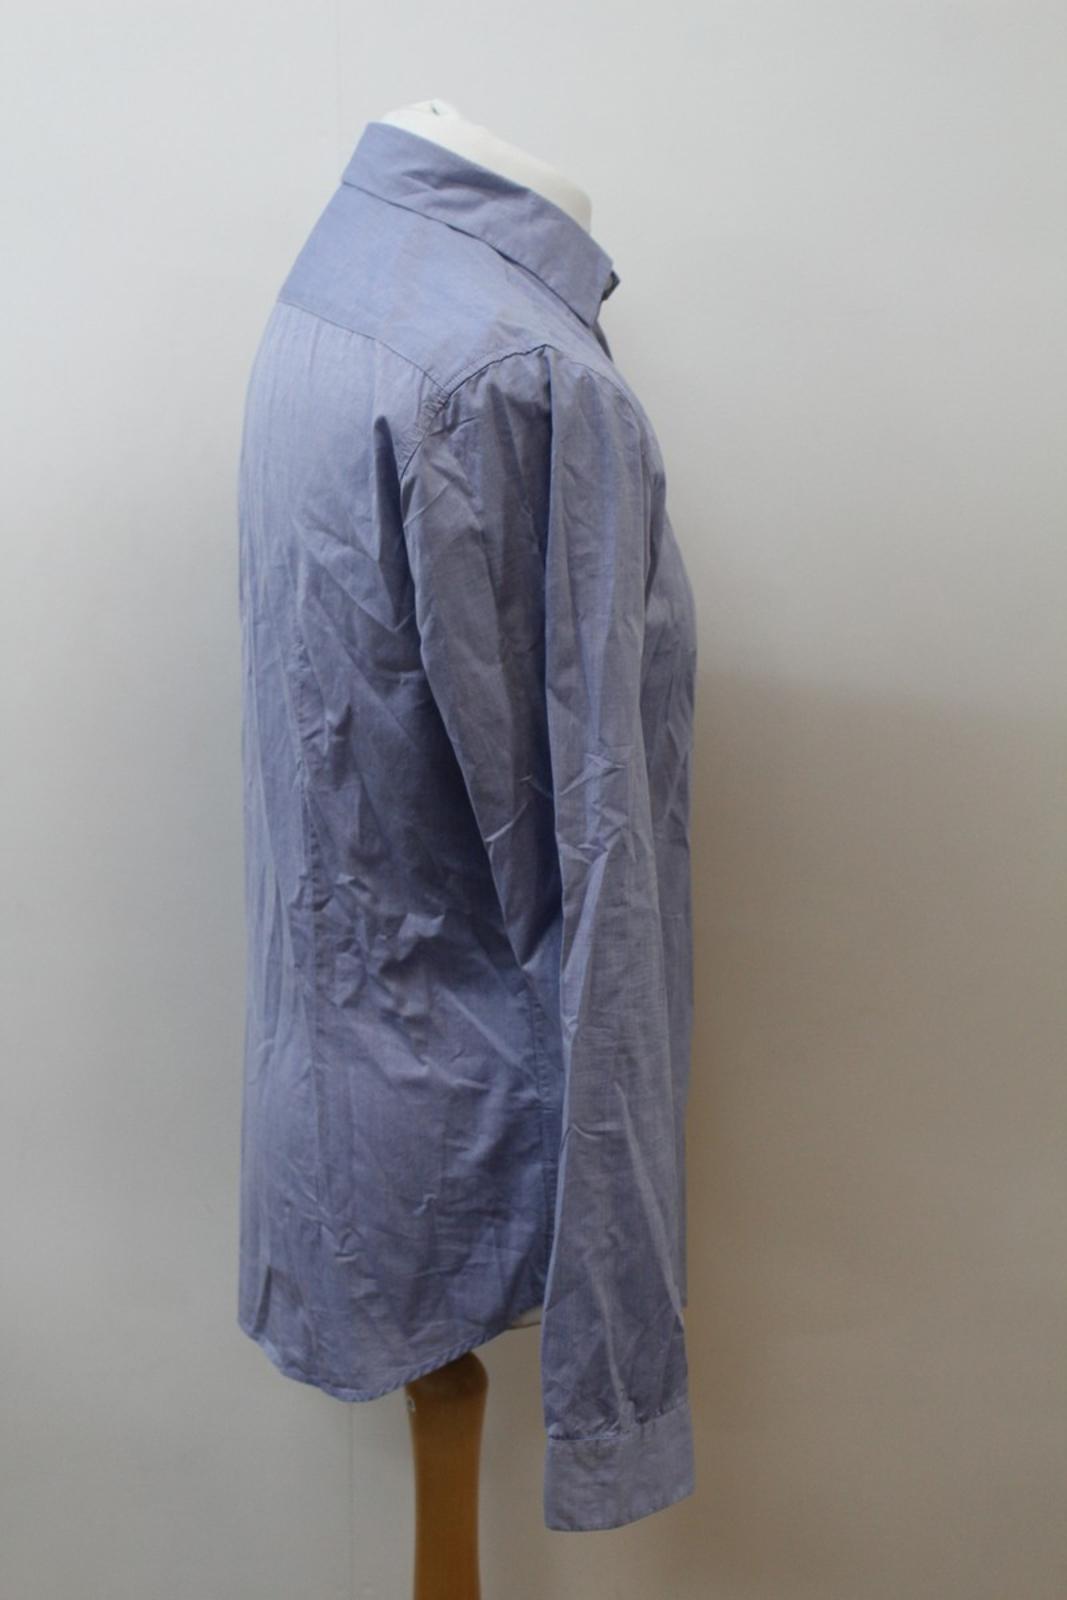 Boss-Orange-men-Azul-Algodon-Manga-Larga-Cuello-Con-Cuello-Informal-Camisa-Talla-M miniatura 4